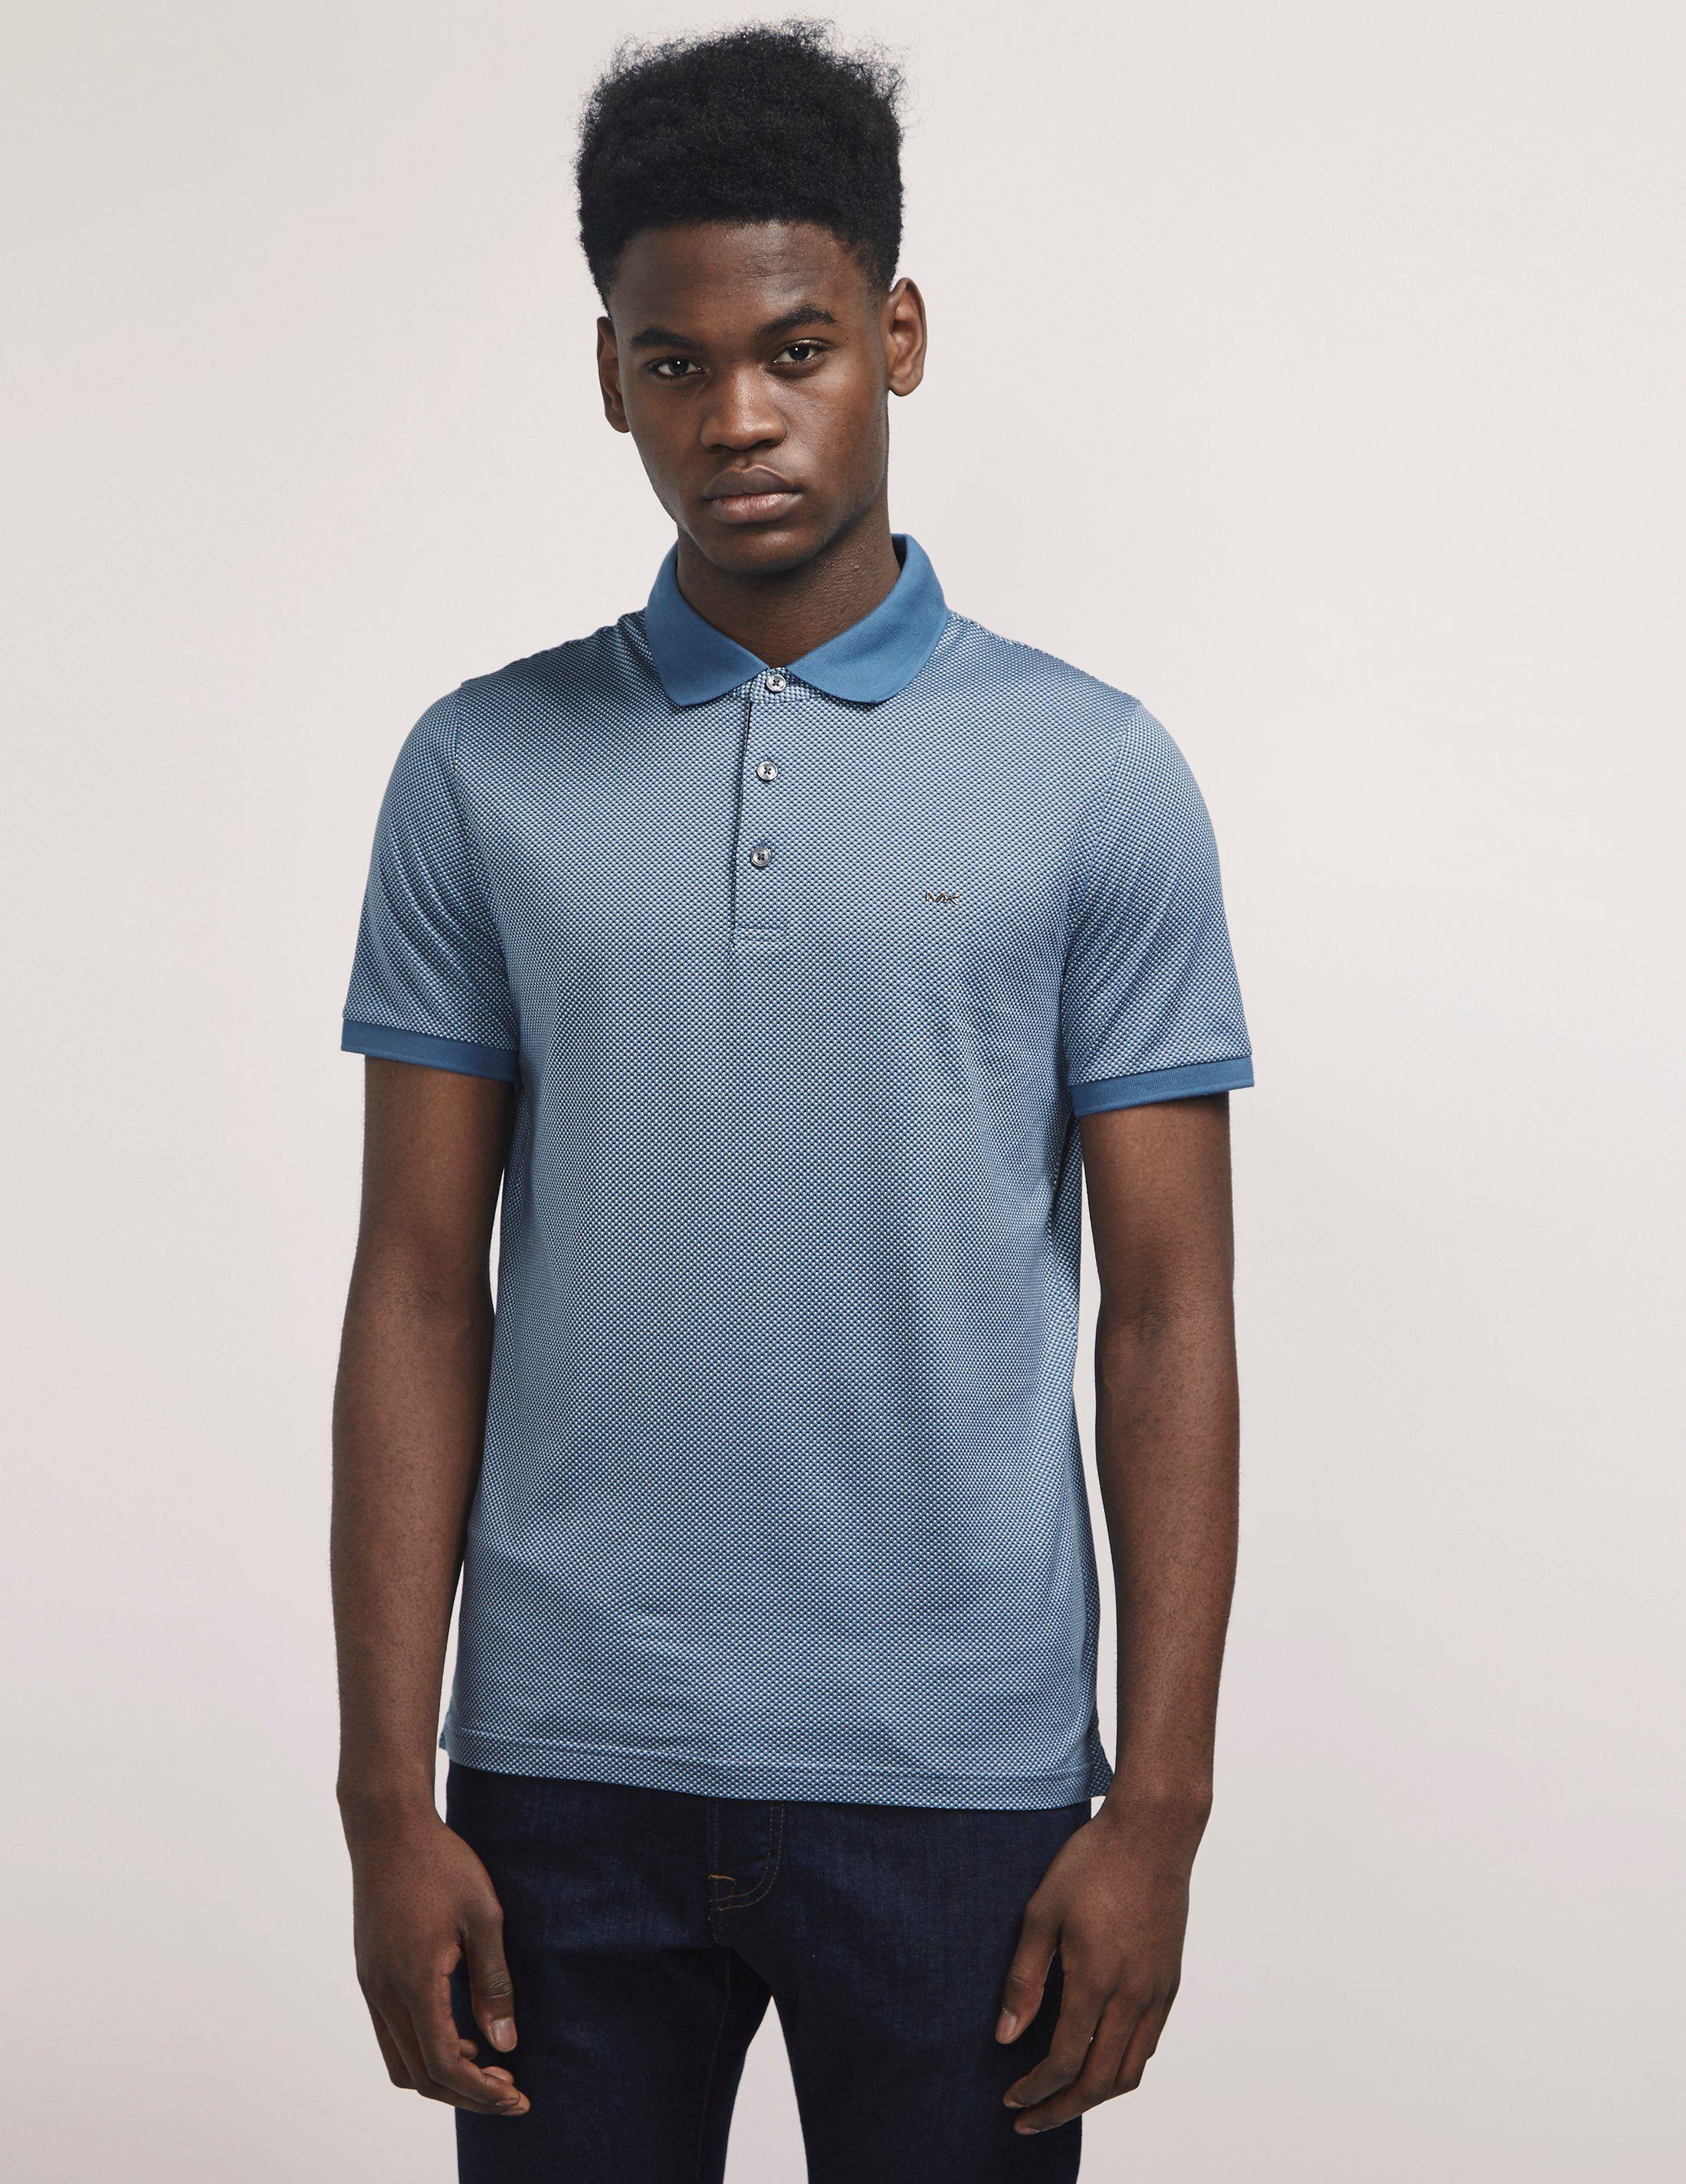 Michael Kors Dot Short Sleeve Polo Shirt